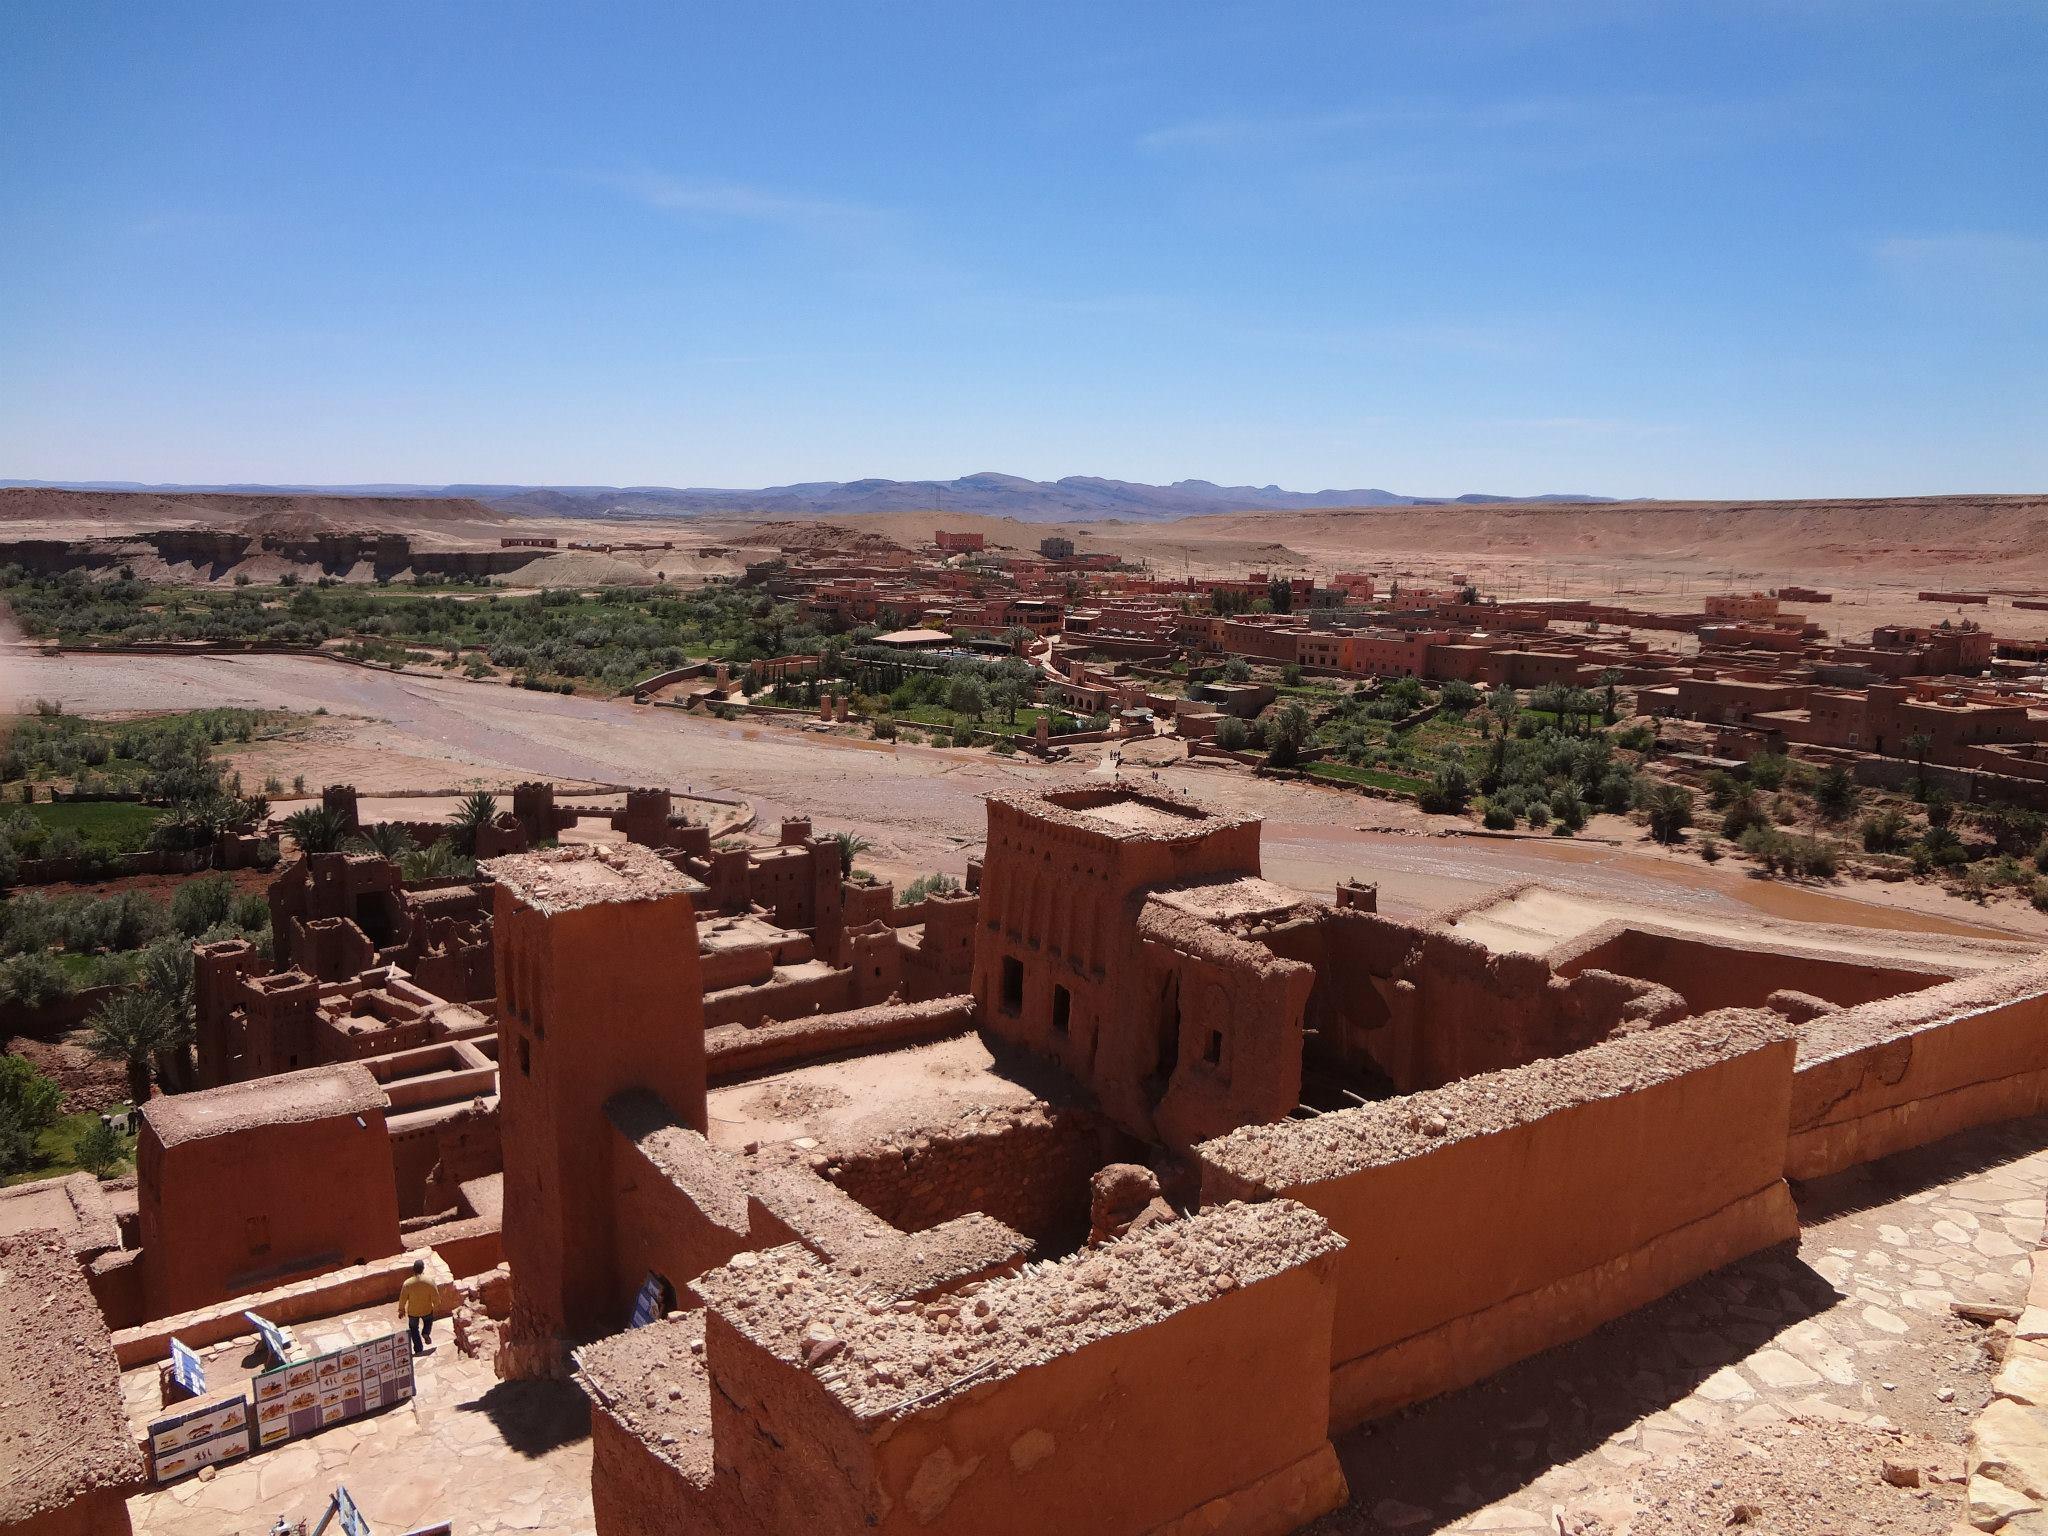 Vista de Ait Benhaddou